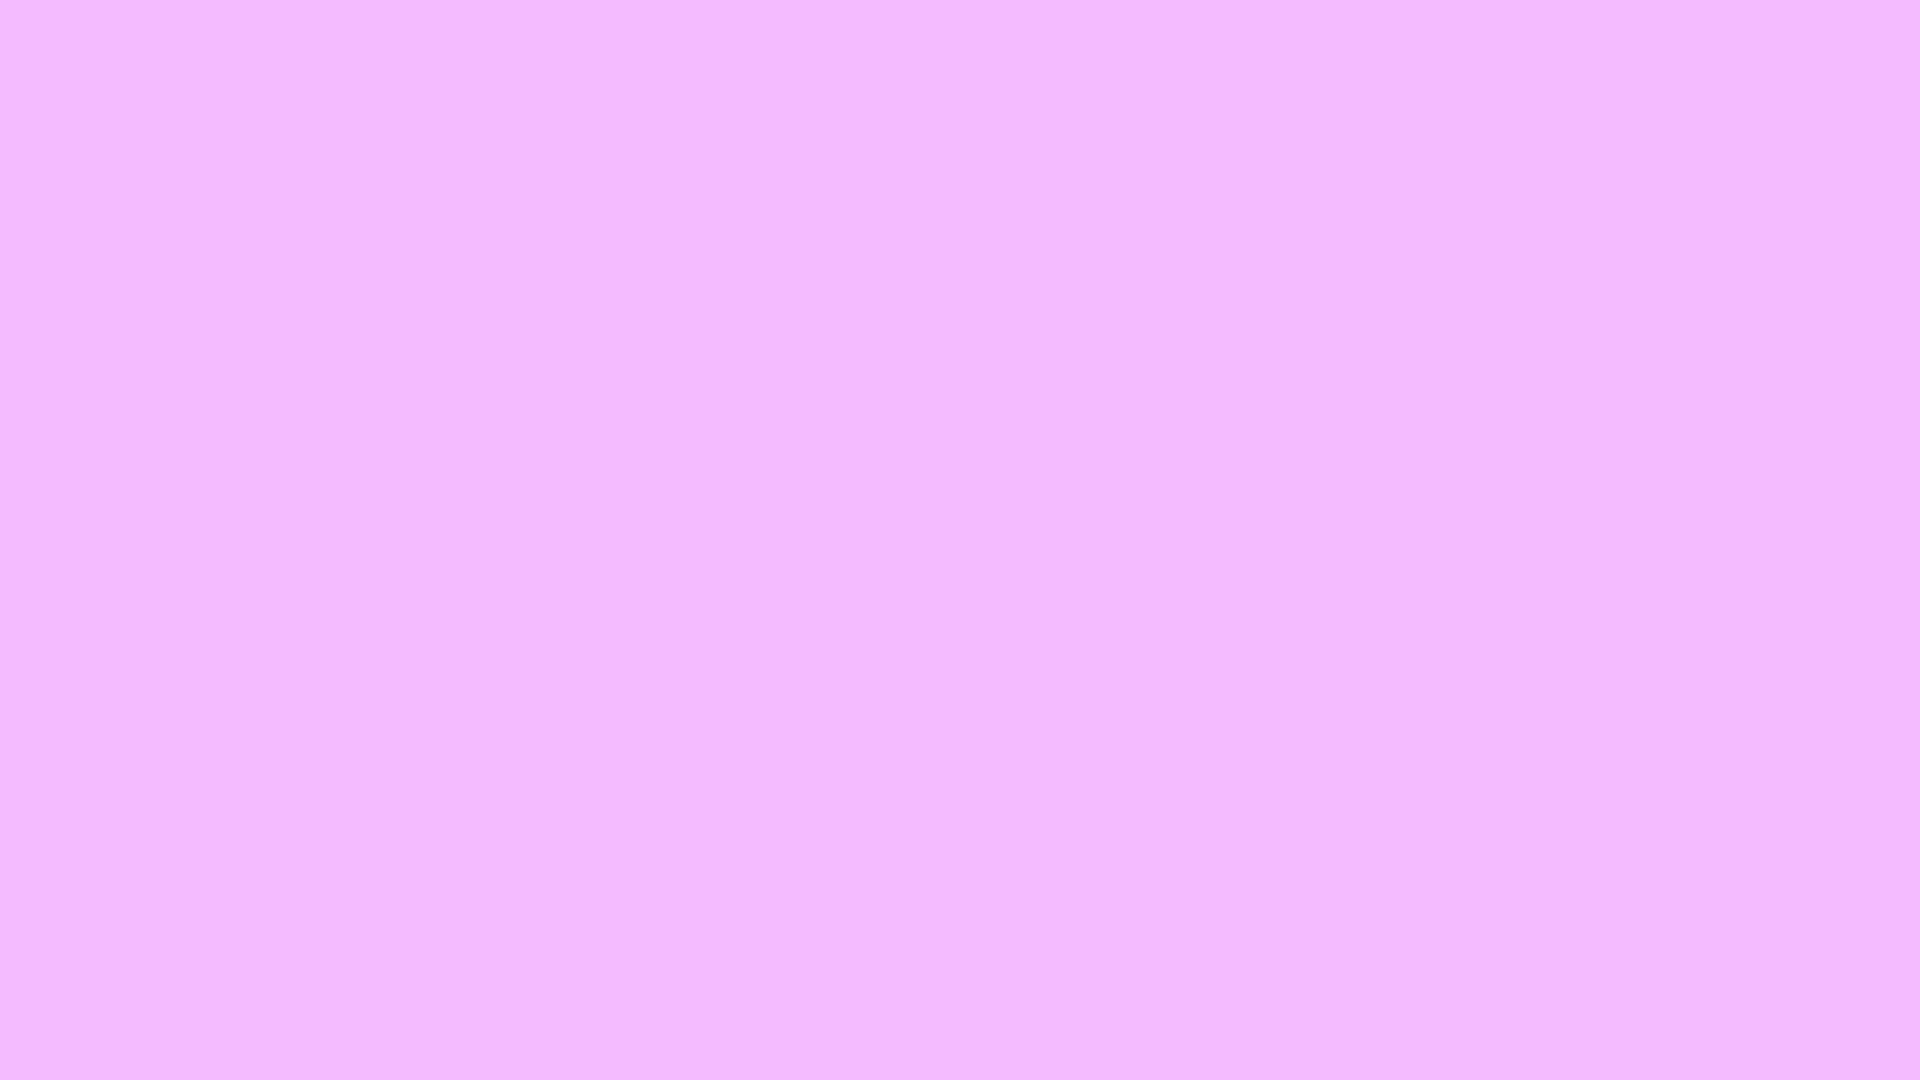 1920x1080 Brilliant Lavender Solid Color Background